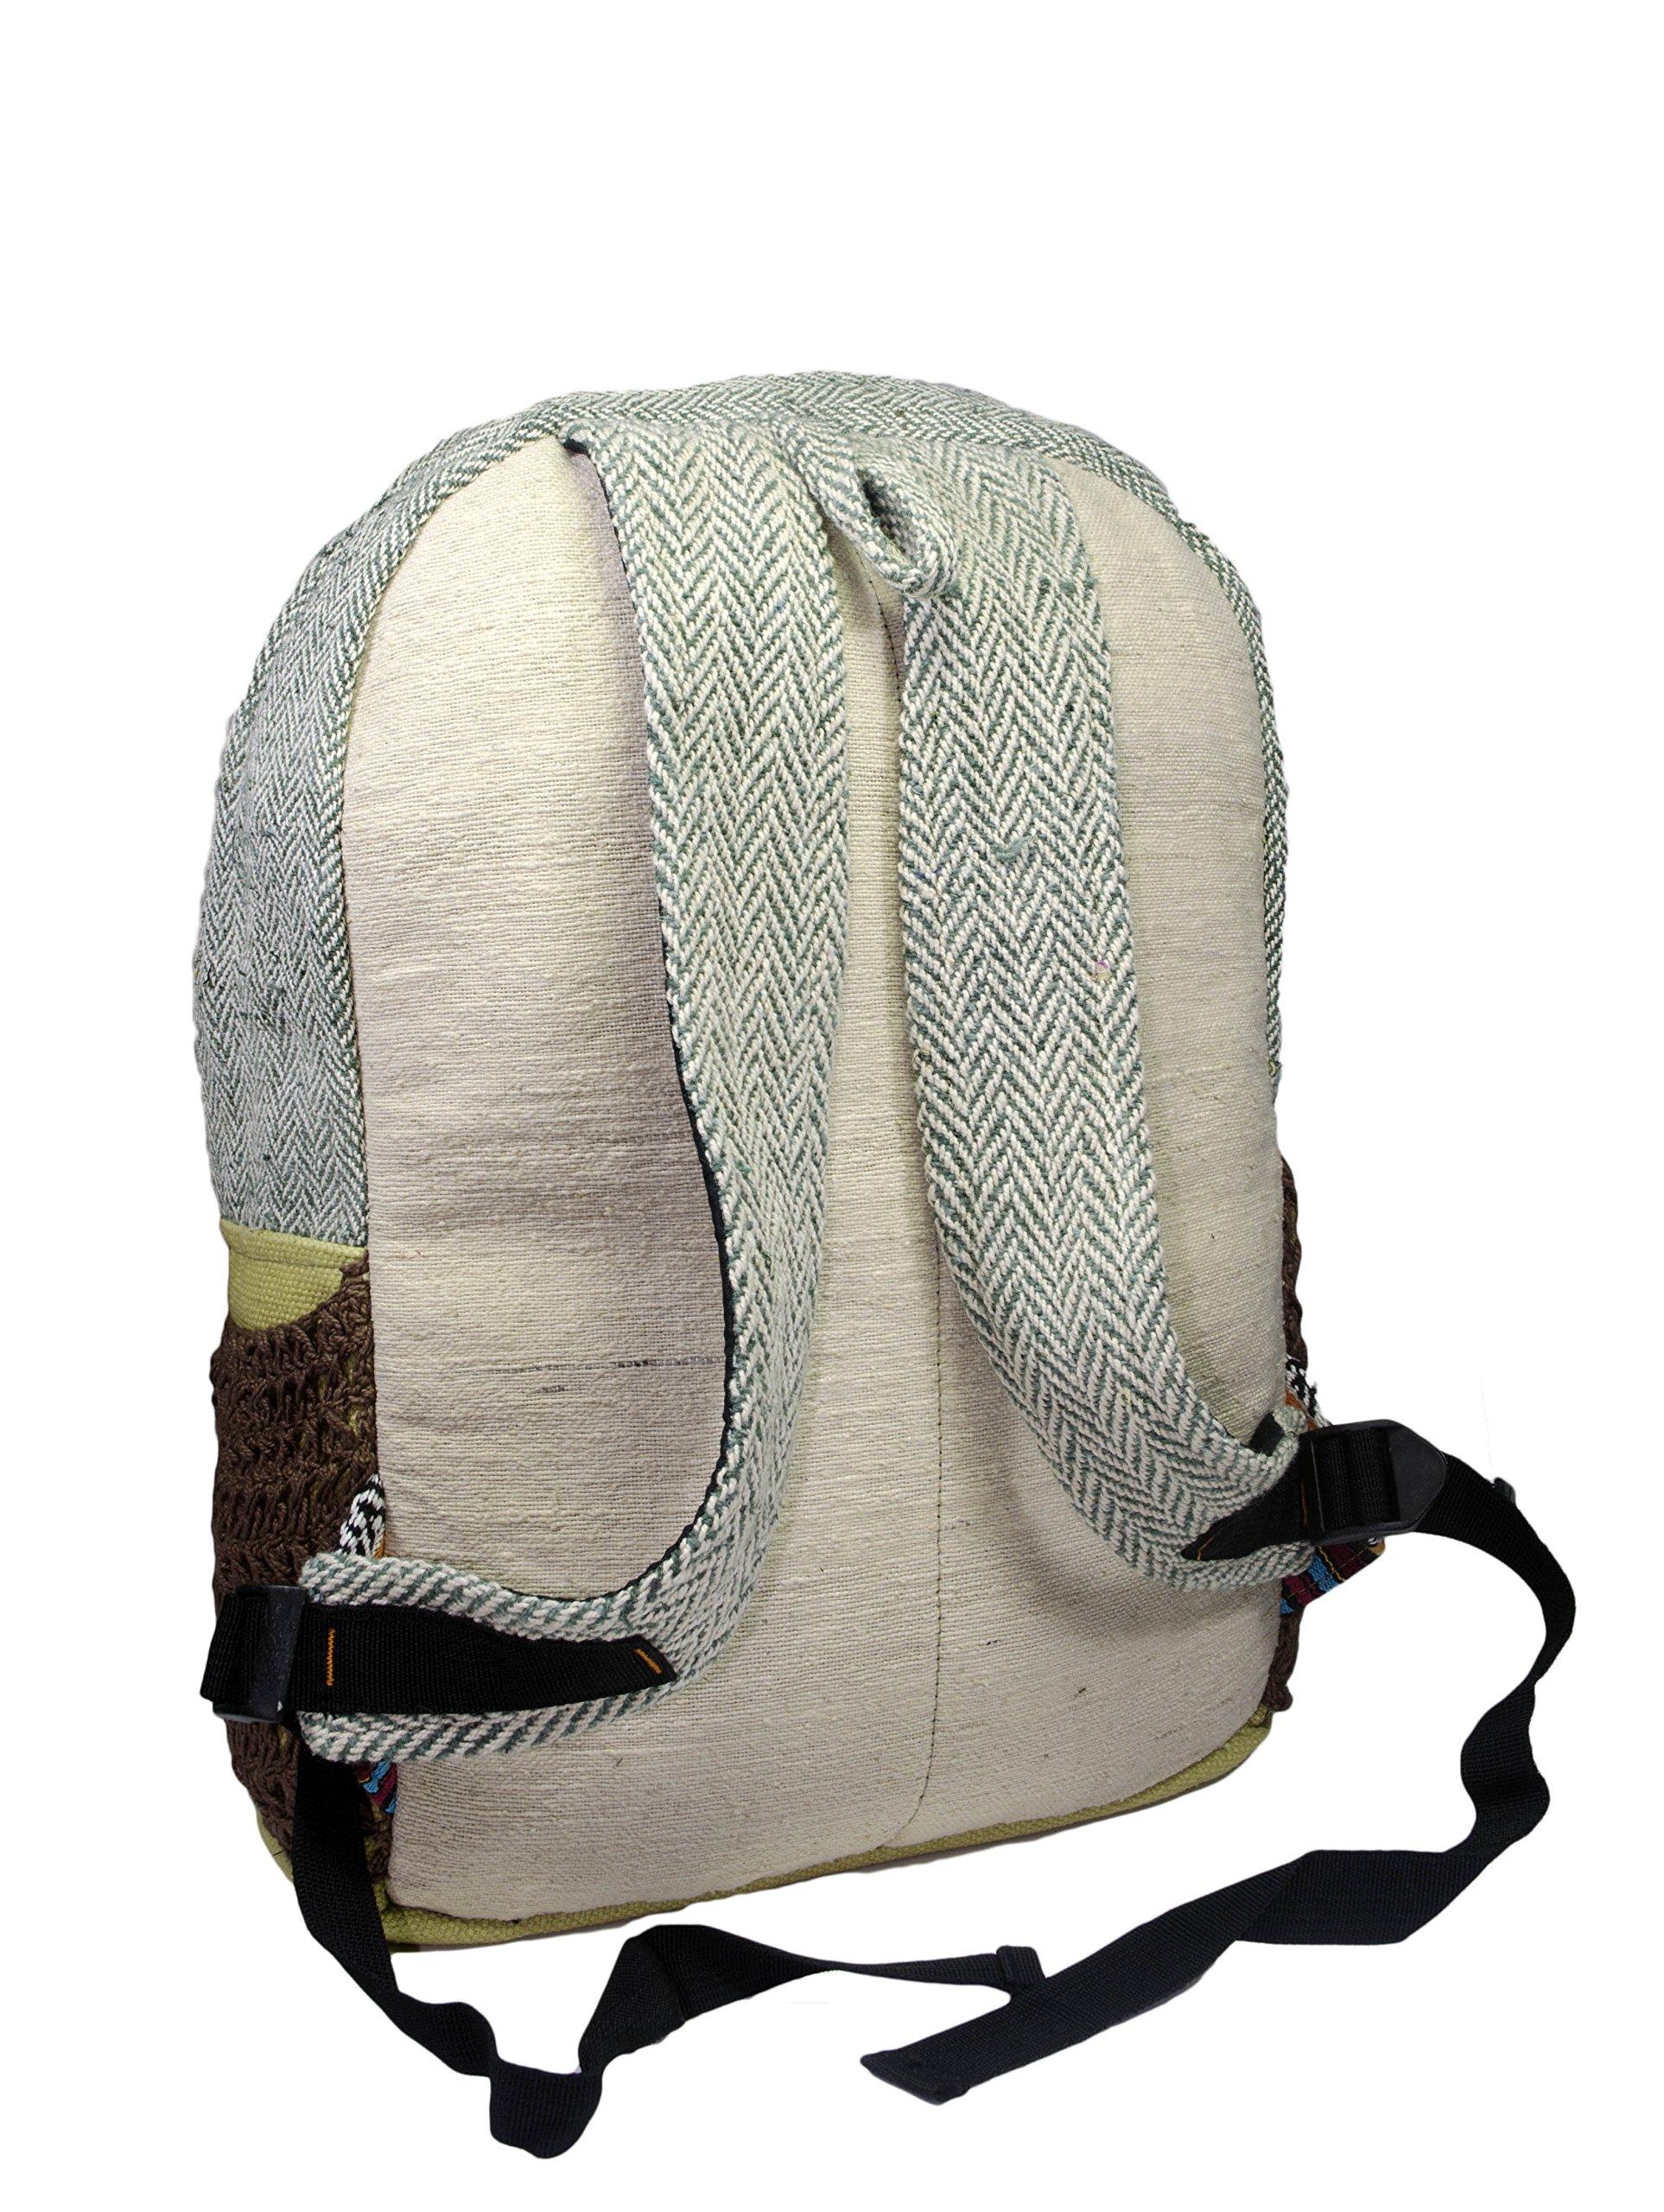 Hemp Handmade Himlayan Backpack ( THC FREE) (Type 1) by Polykarmatic (Image #2)